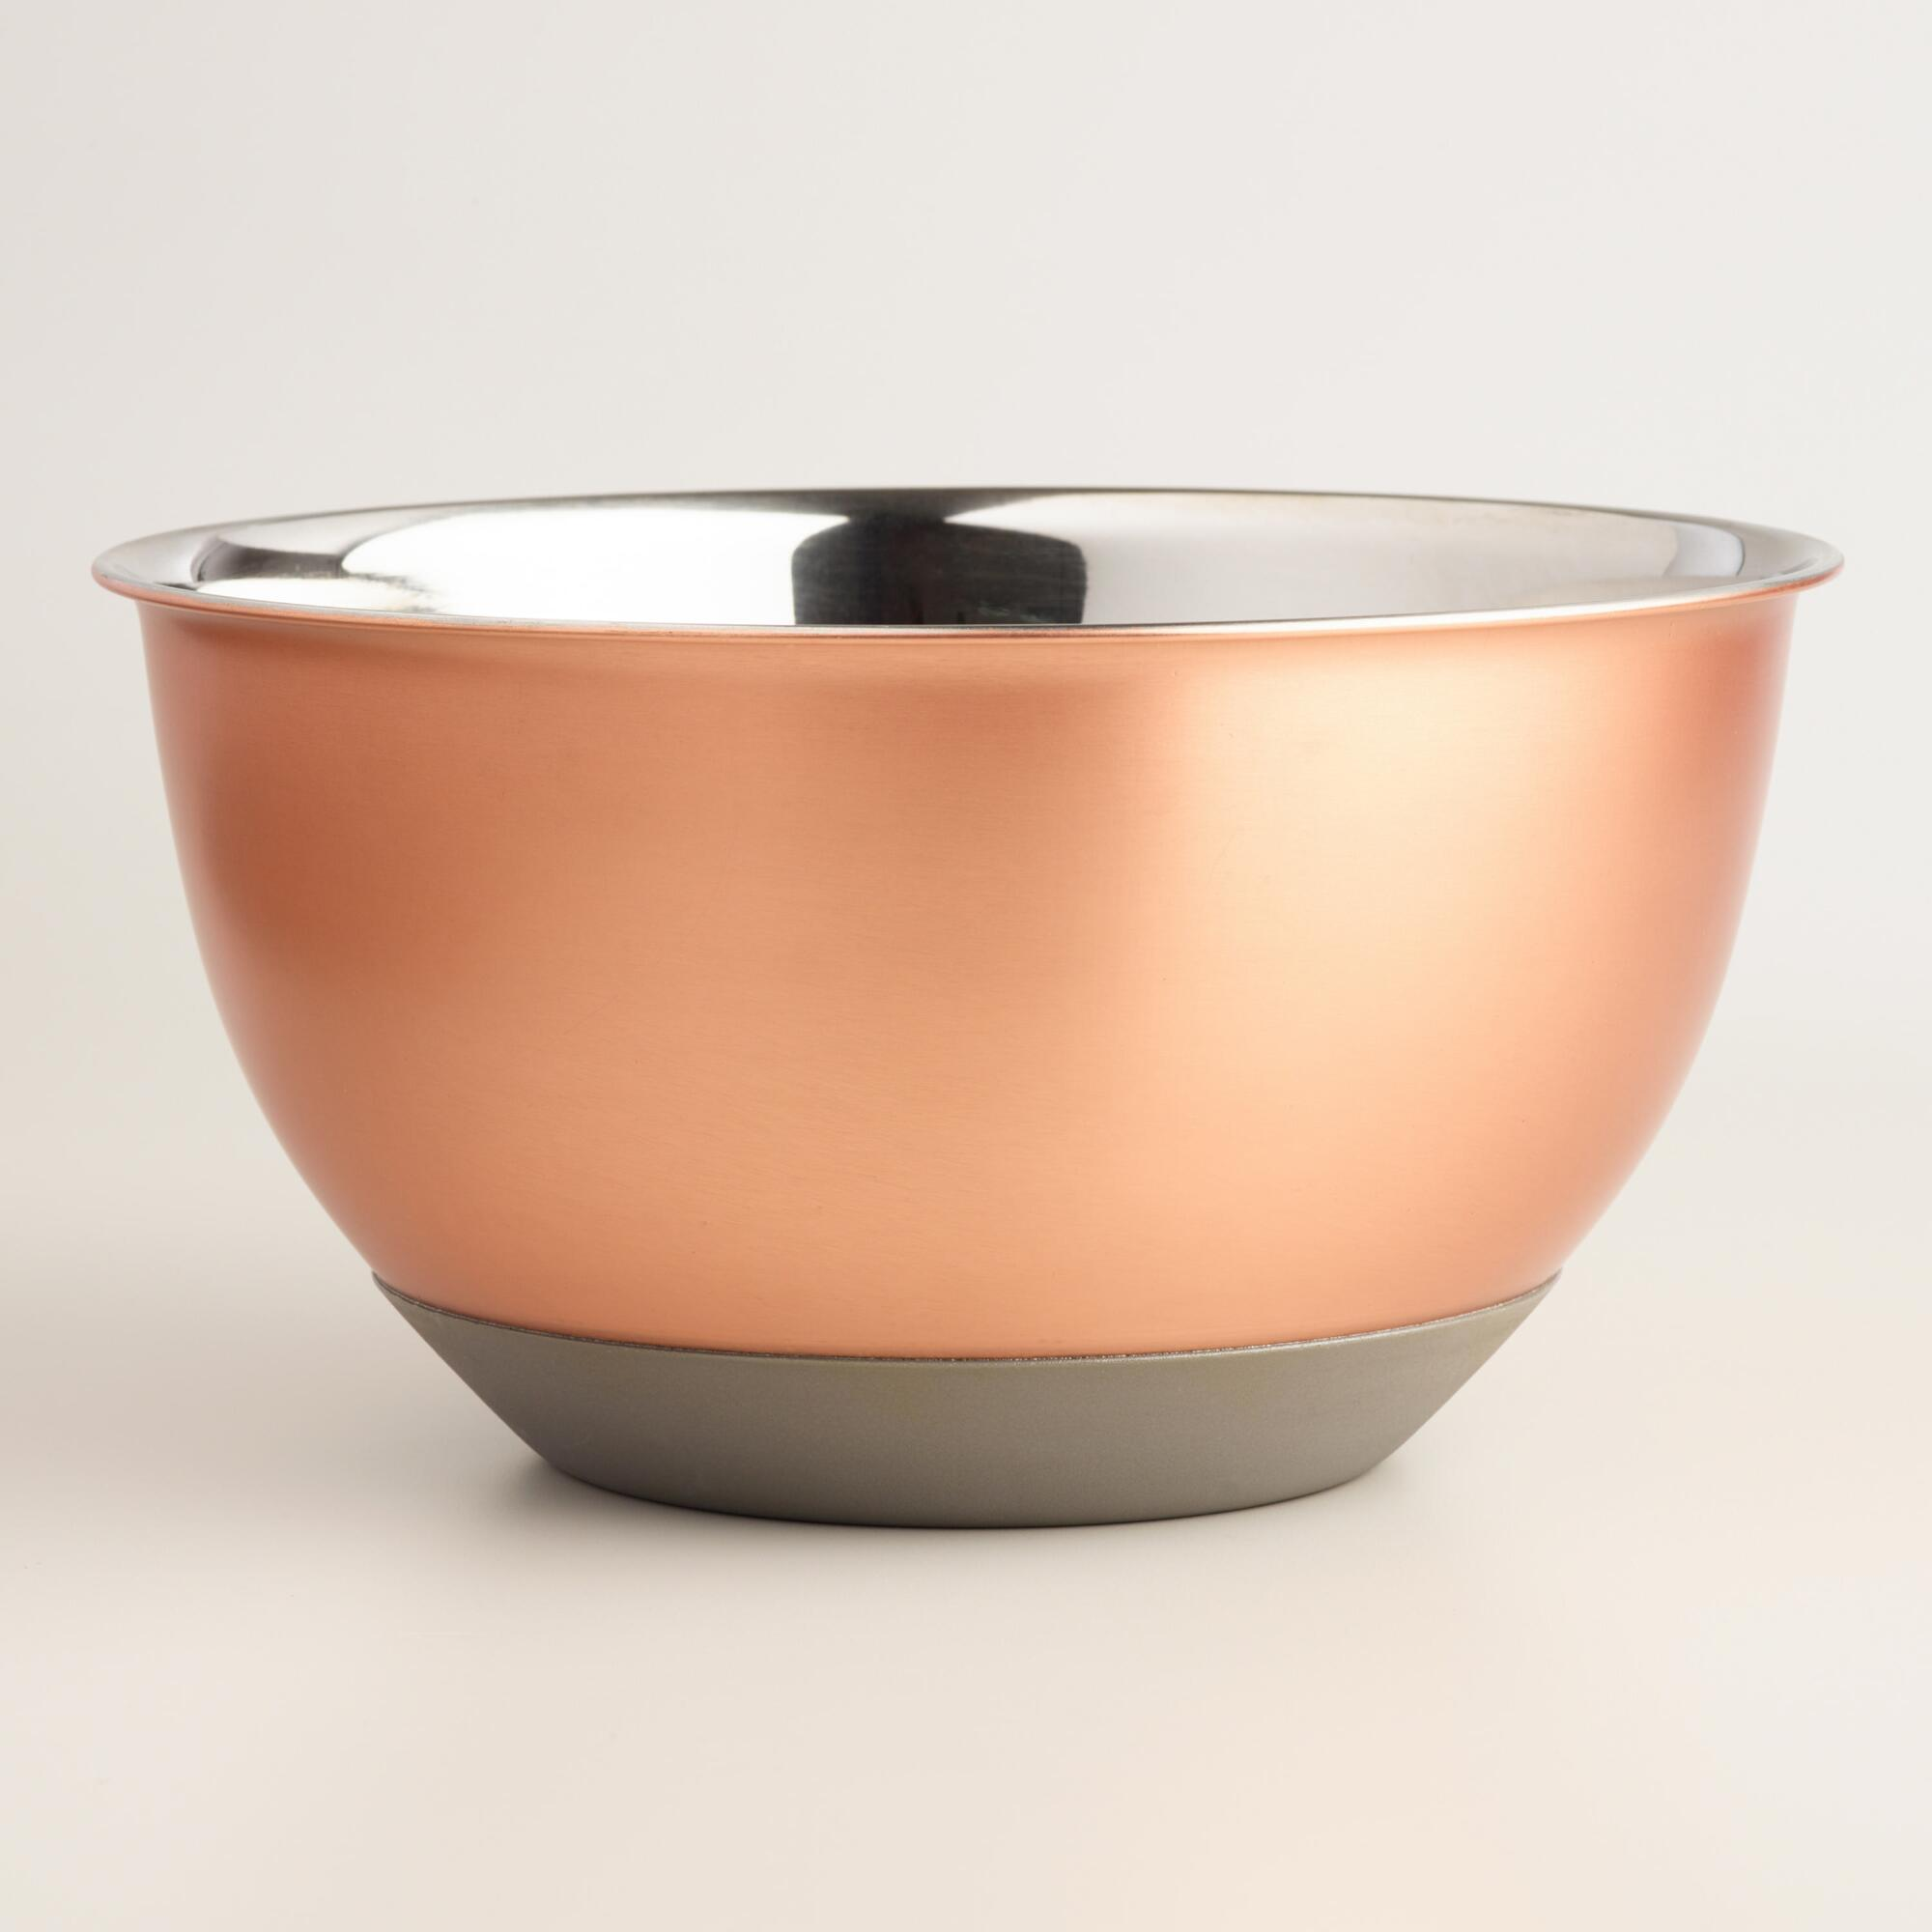 6 Quart Copper Nonskid Mixing Bowl | World Market